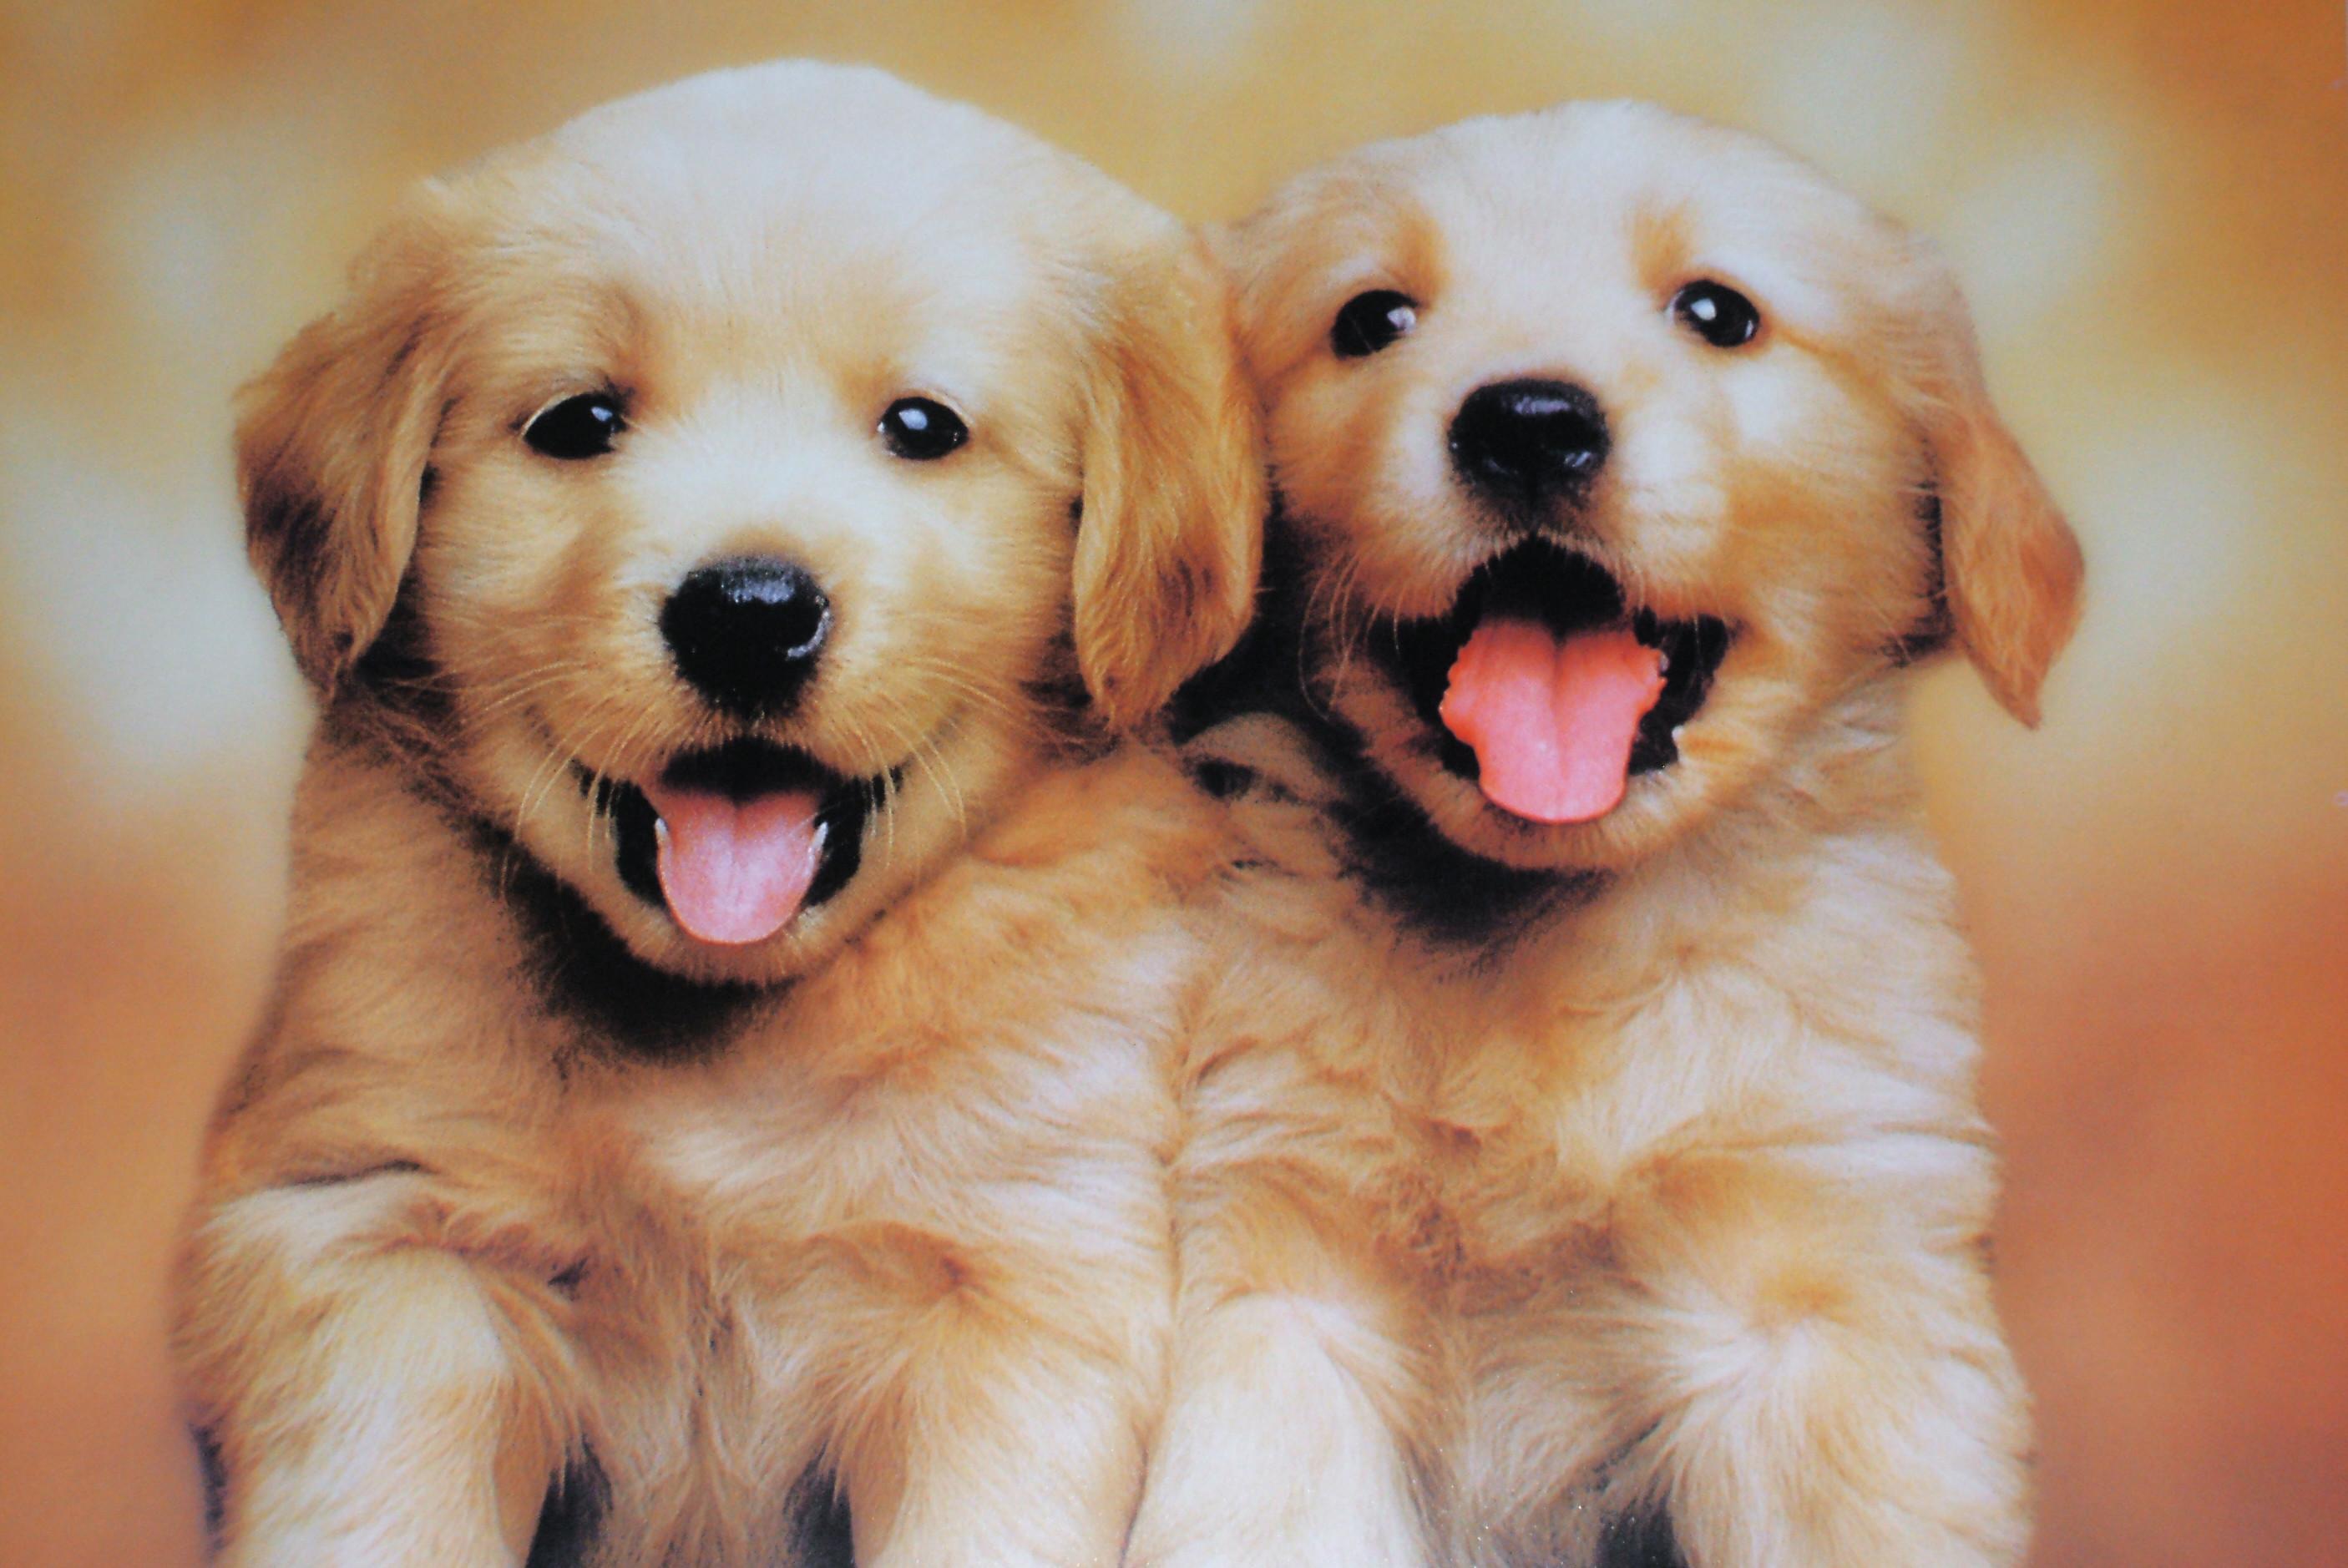 Description For Cute Twin Puppies Wallpaper Cute Twin Puppies .